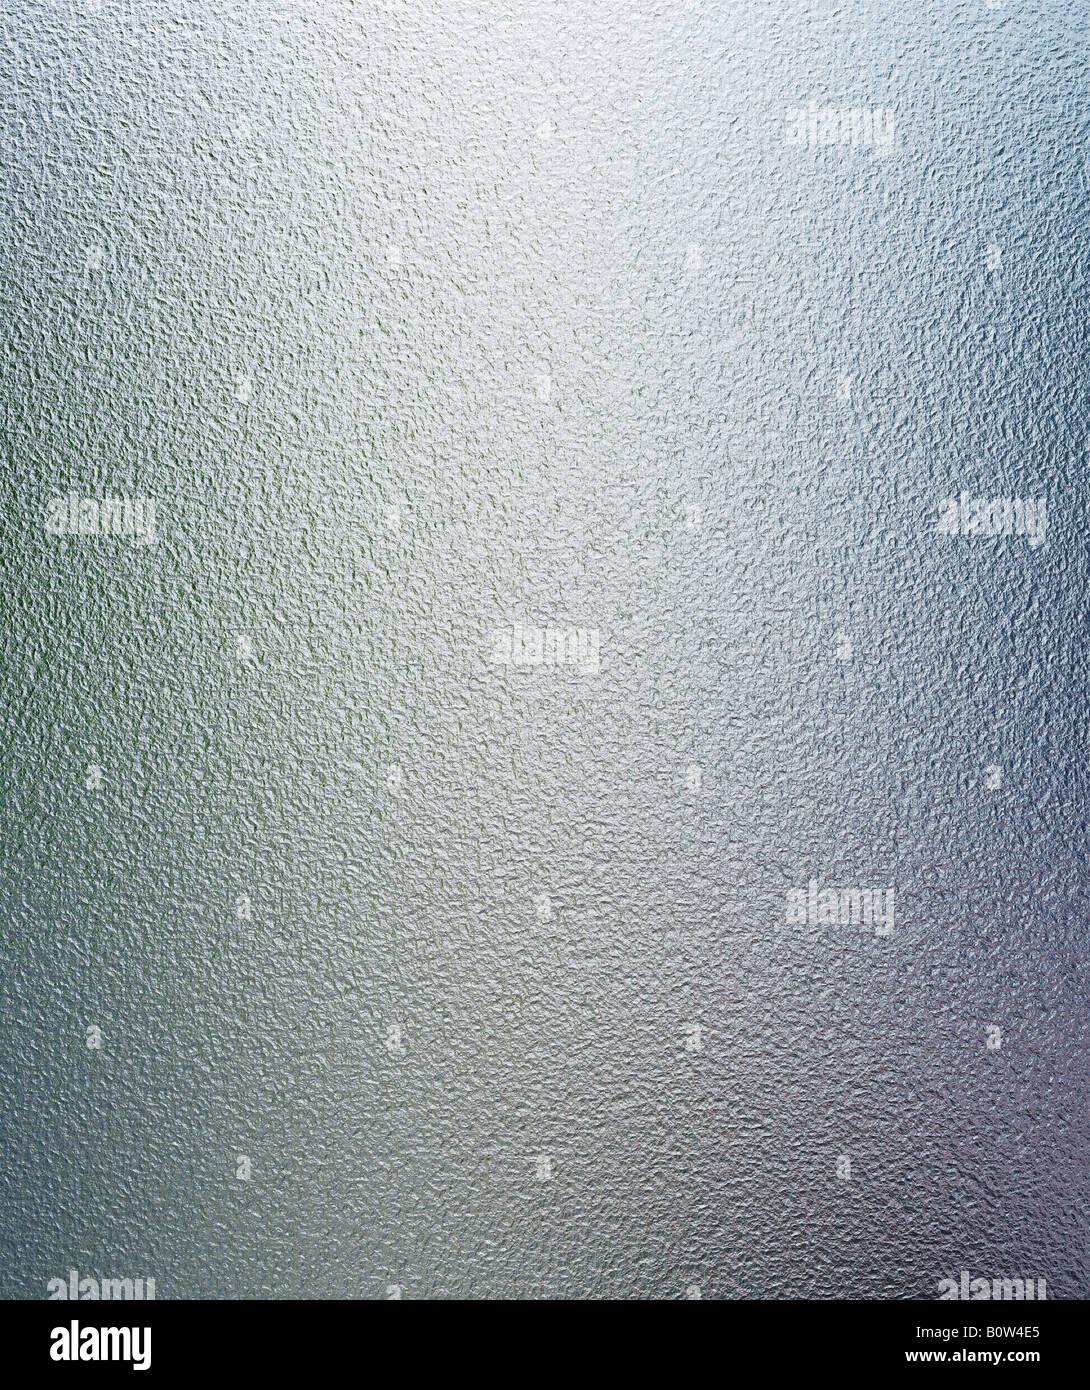 large sheet of nice sheet foil metal texture - Stock Image